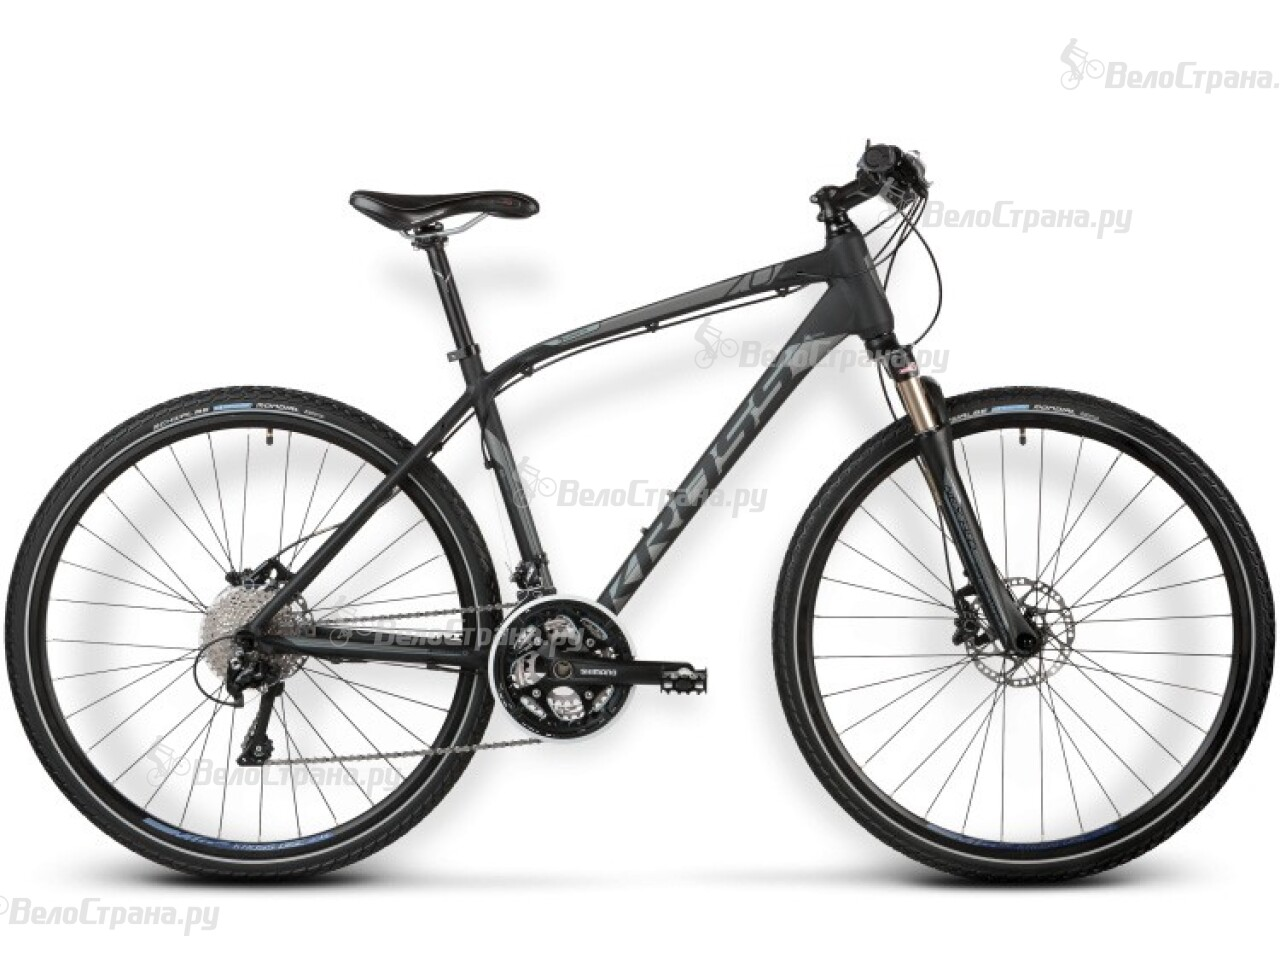 Велосипед Kross EVADO 7.0 (2016) велосипед kross evado 1 0 lady 2017